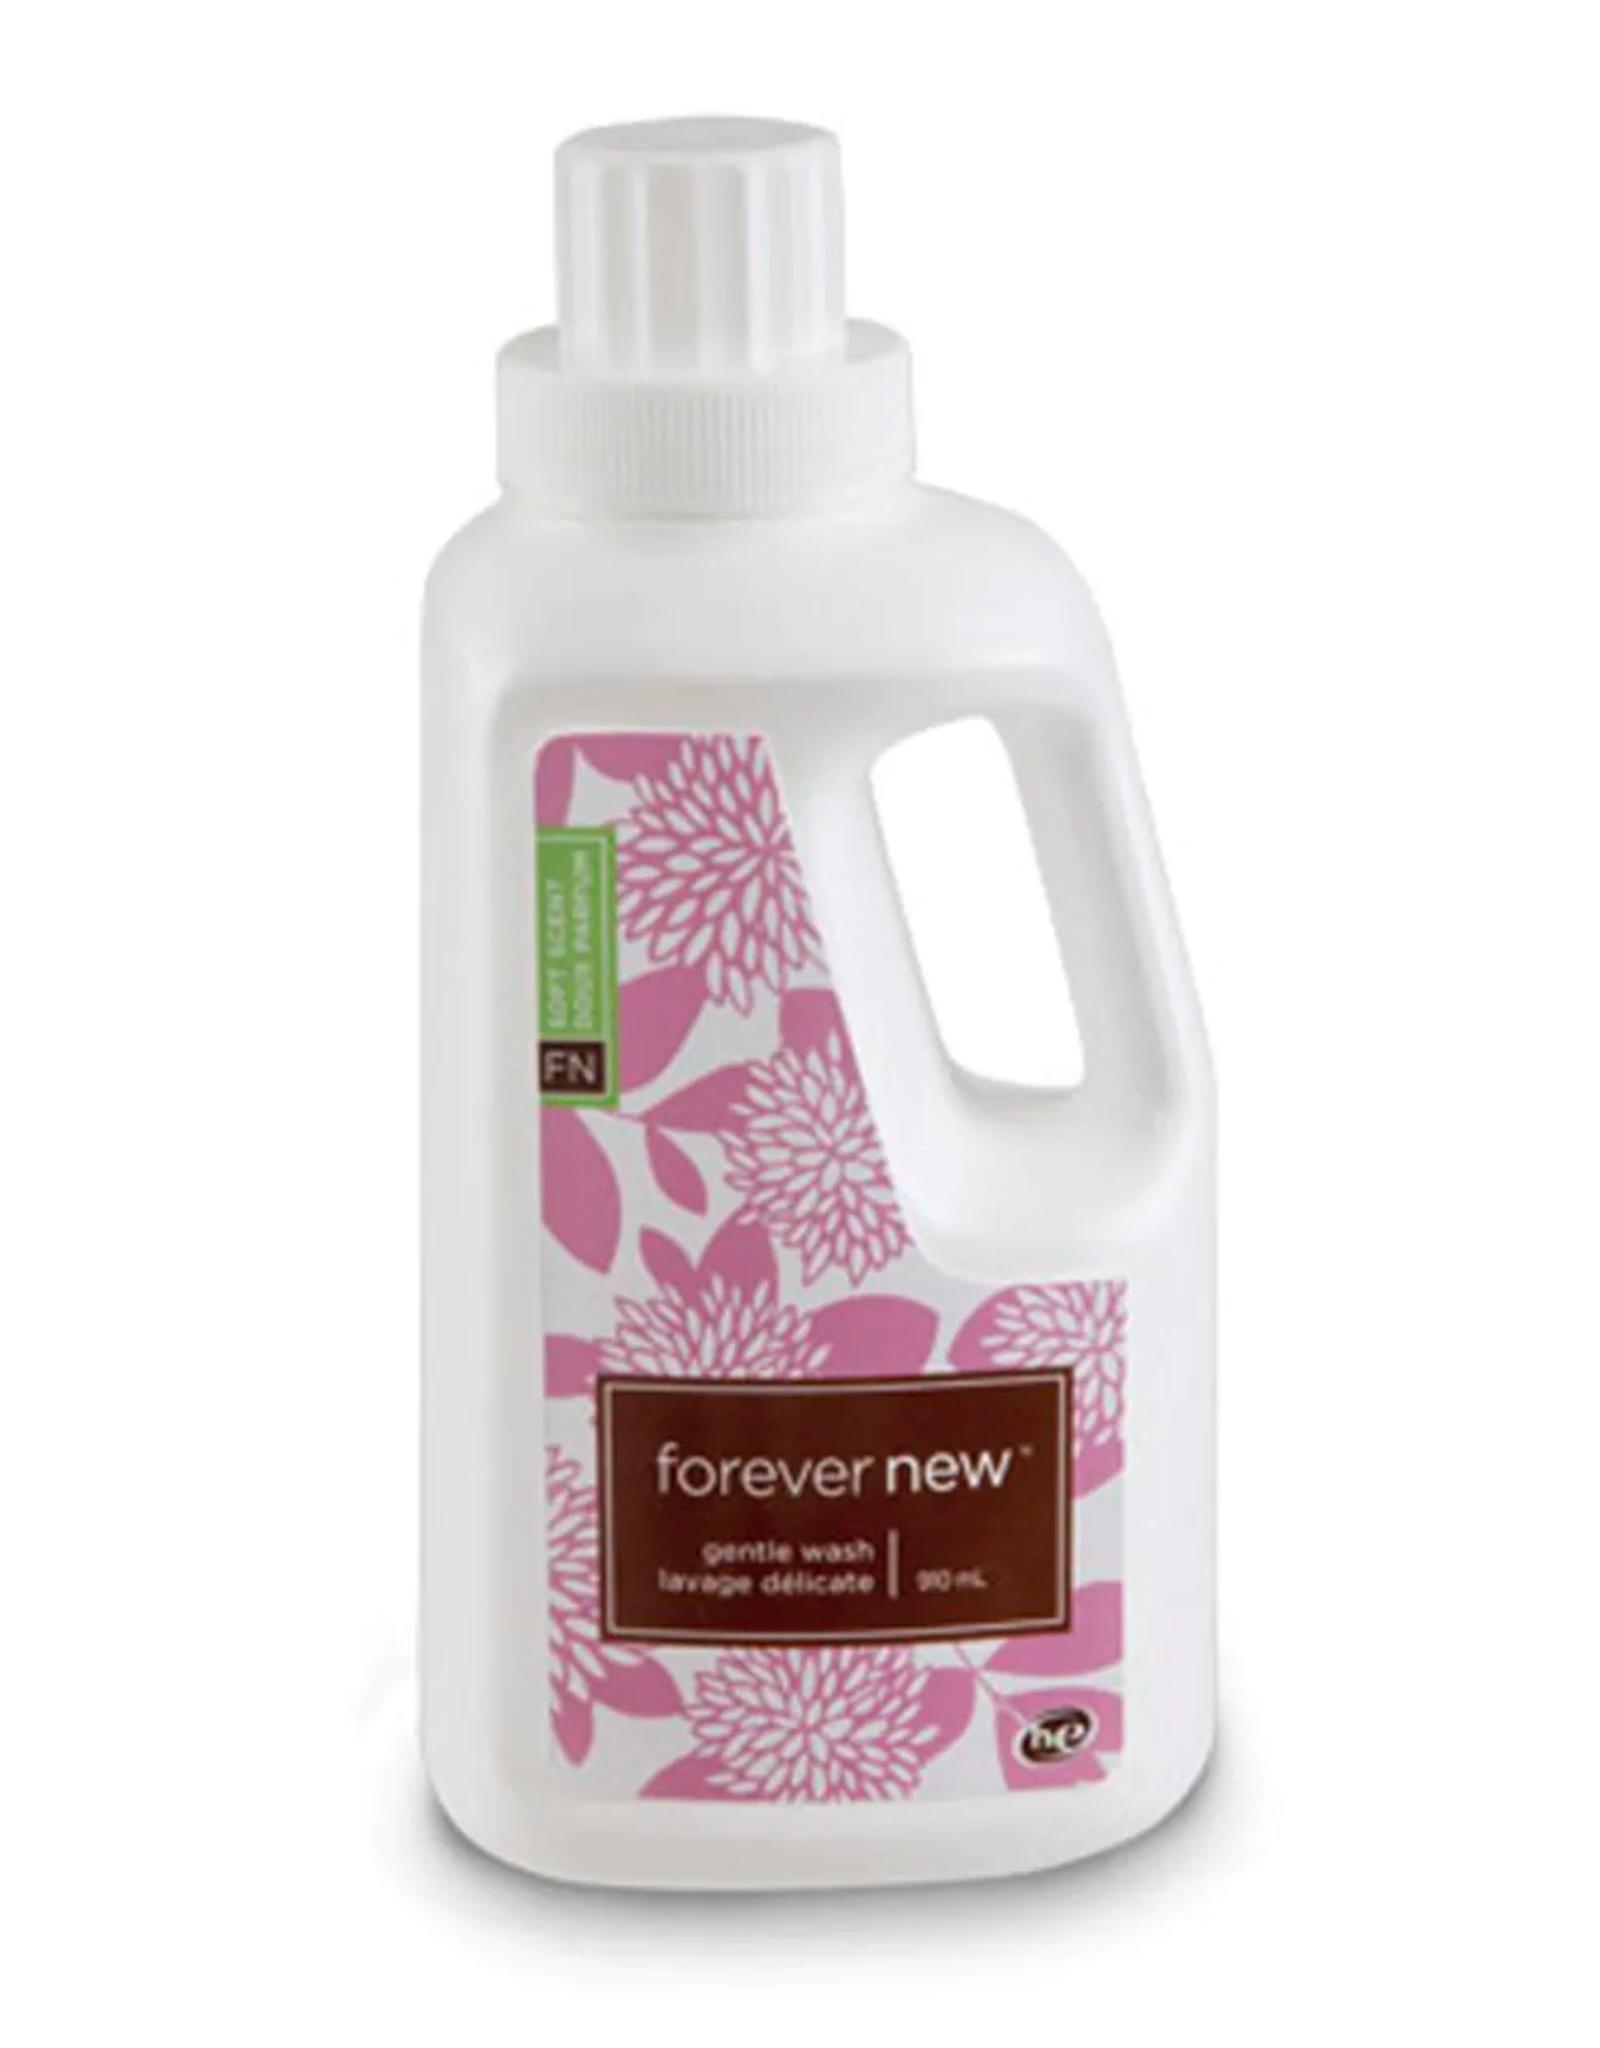 Forever New Liquid Detergent  910ml 02500